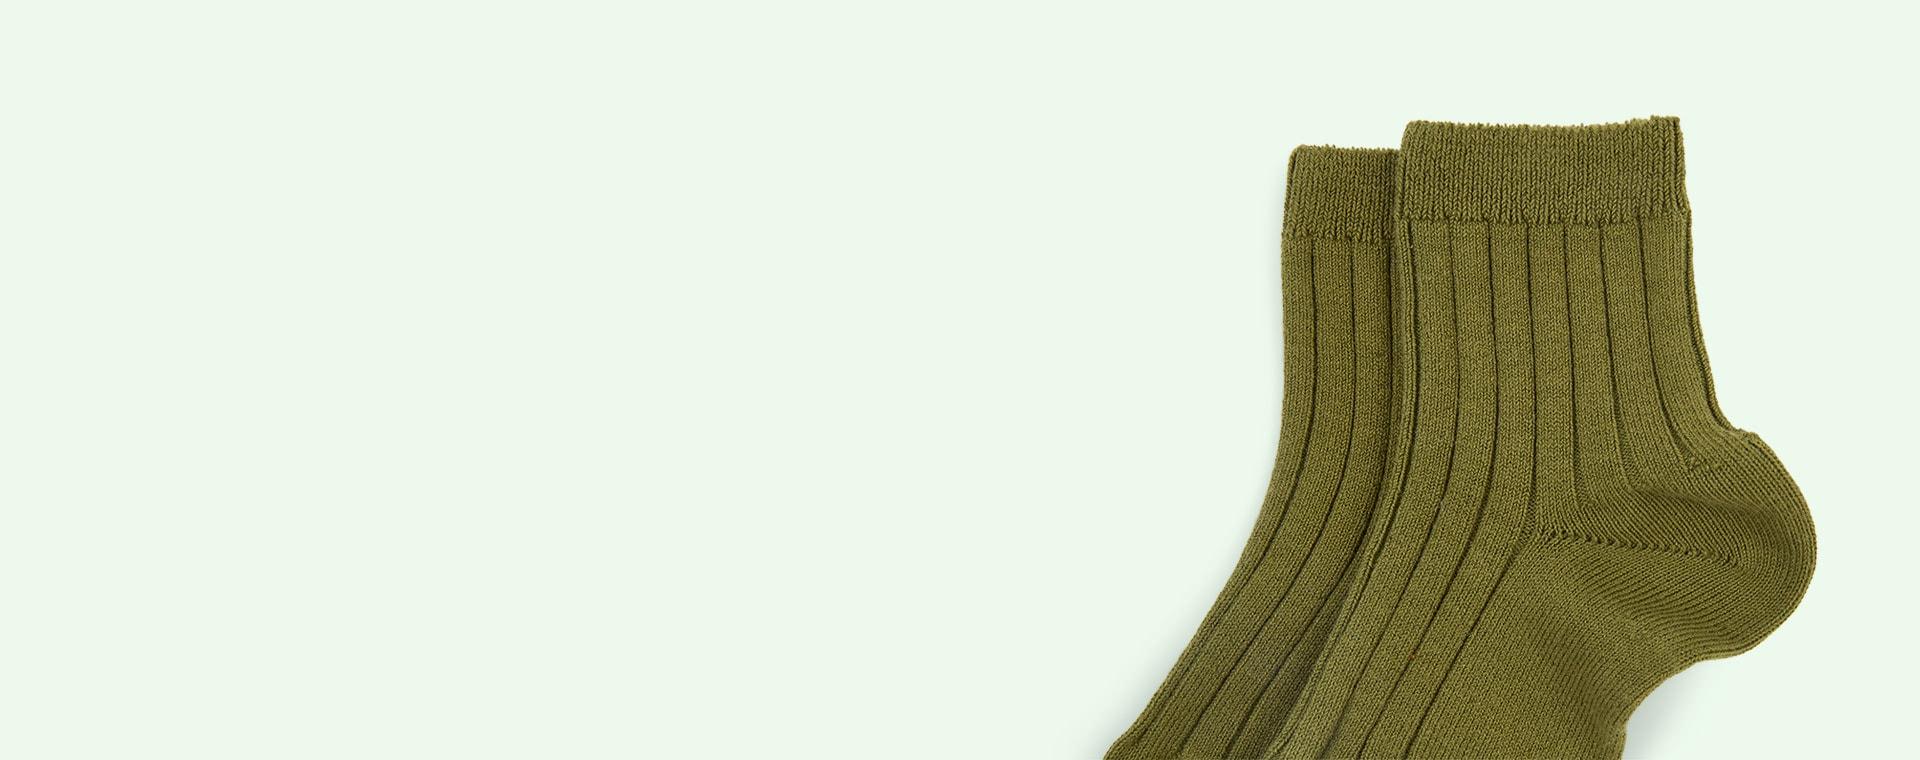 Seaweed Condor Short Ribbed Socks